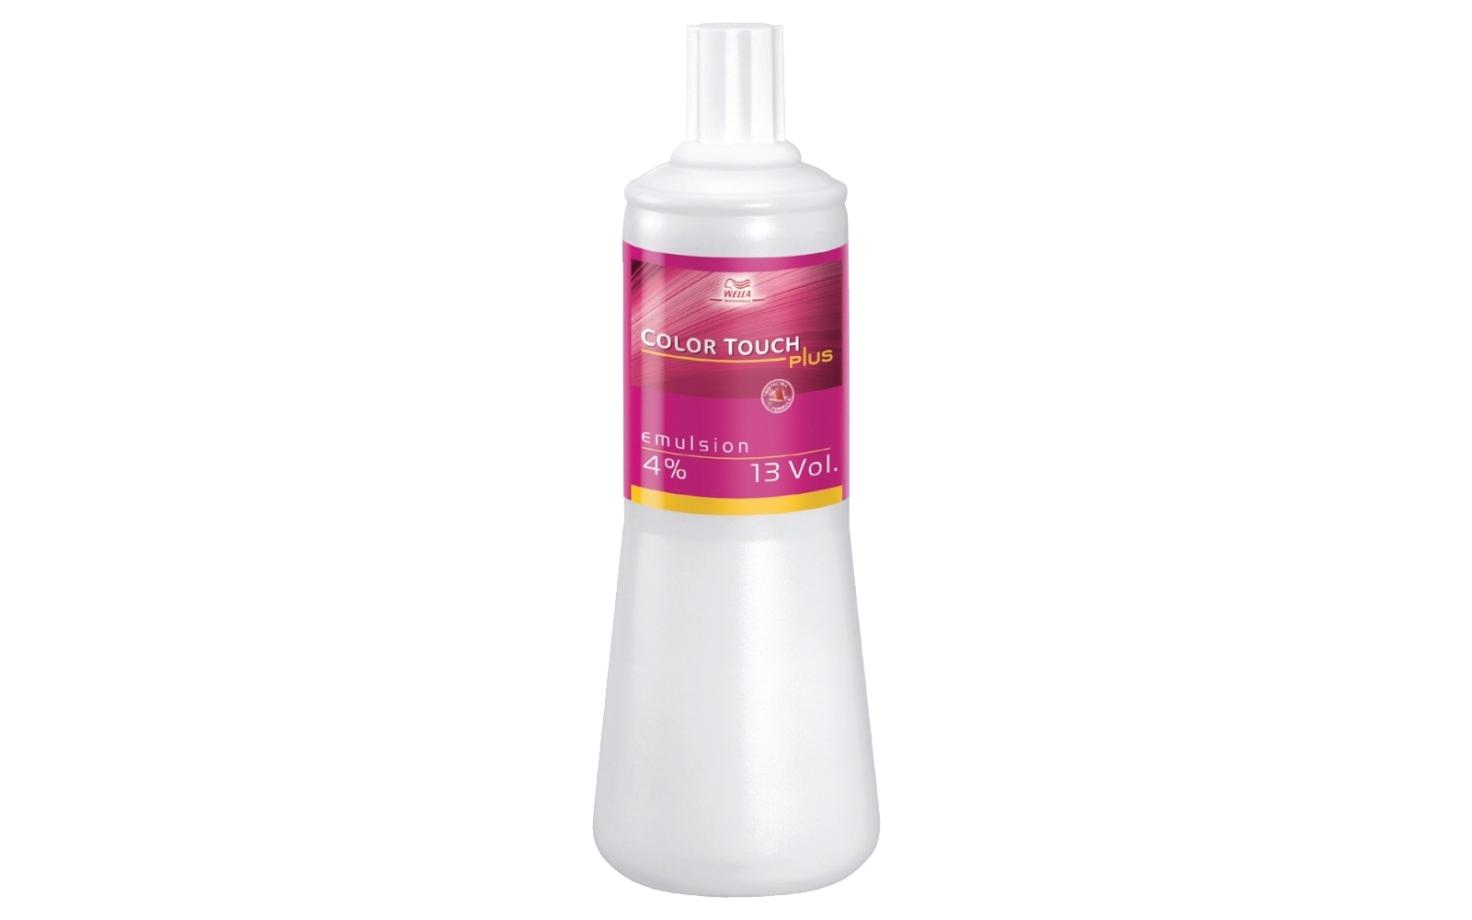 Wella Color Touch  Plus Emulsion 4 %